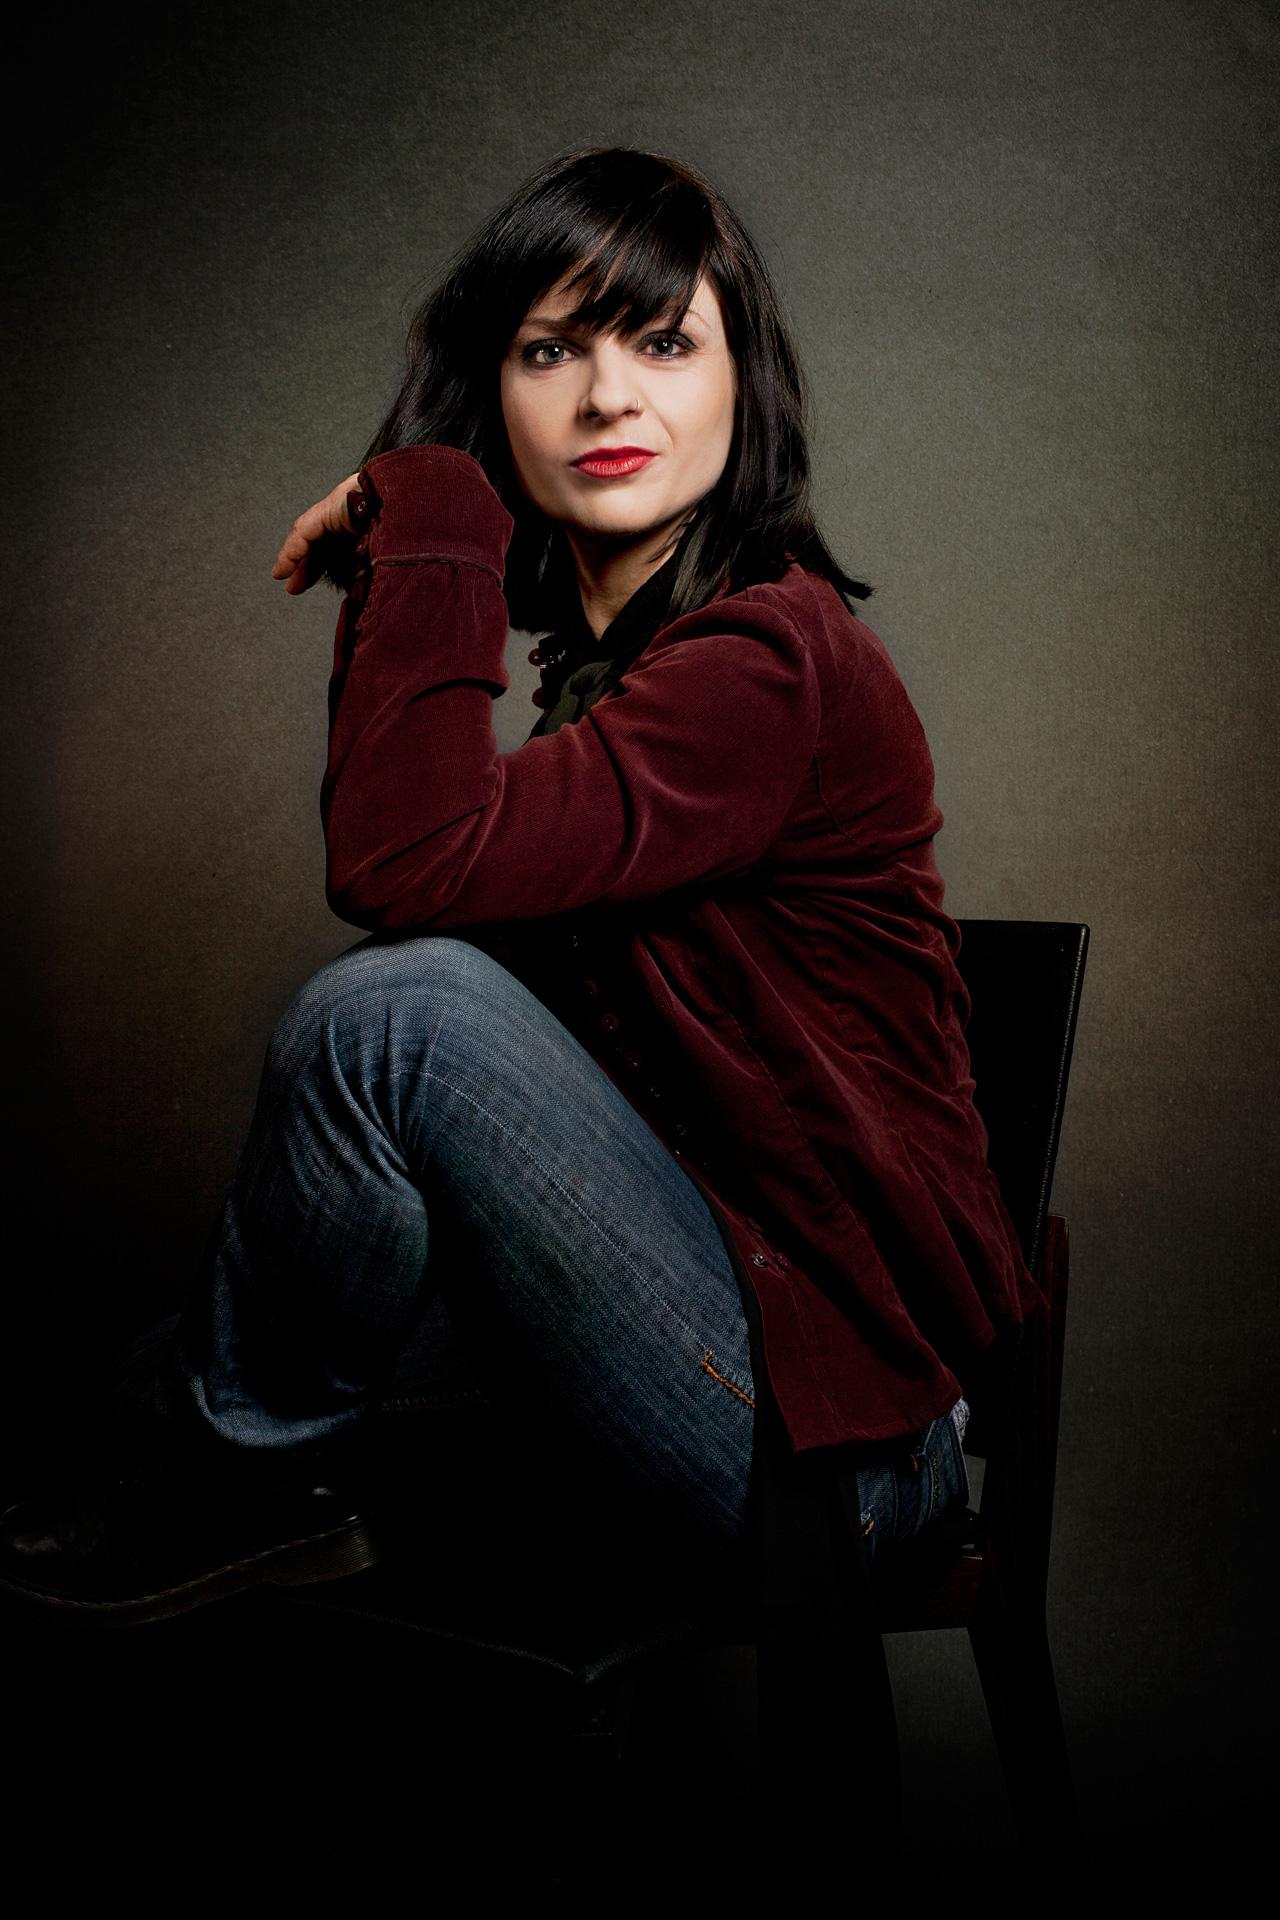 Tania-Mendillo-portret-1.jpg